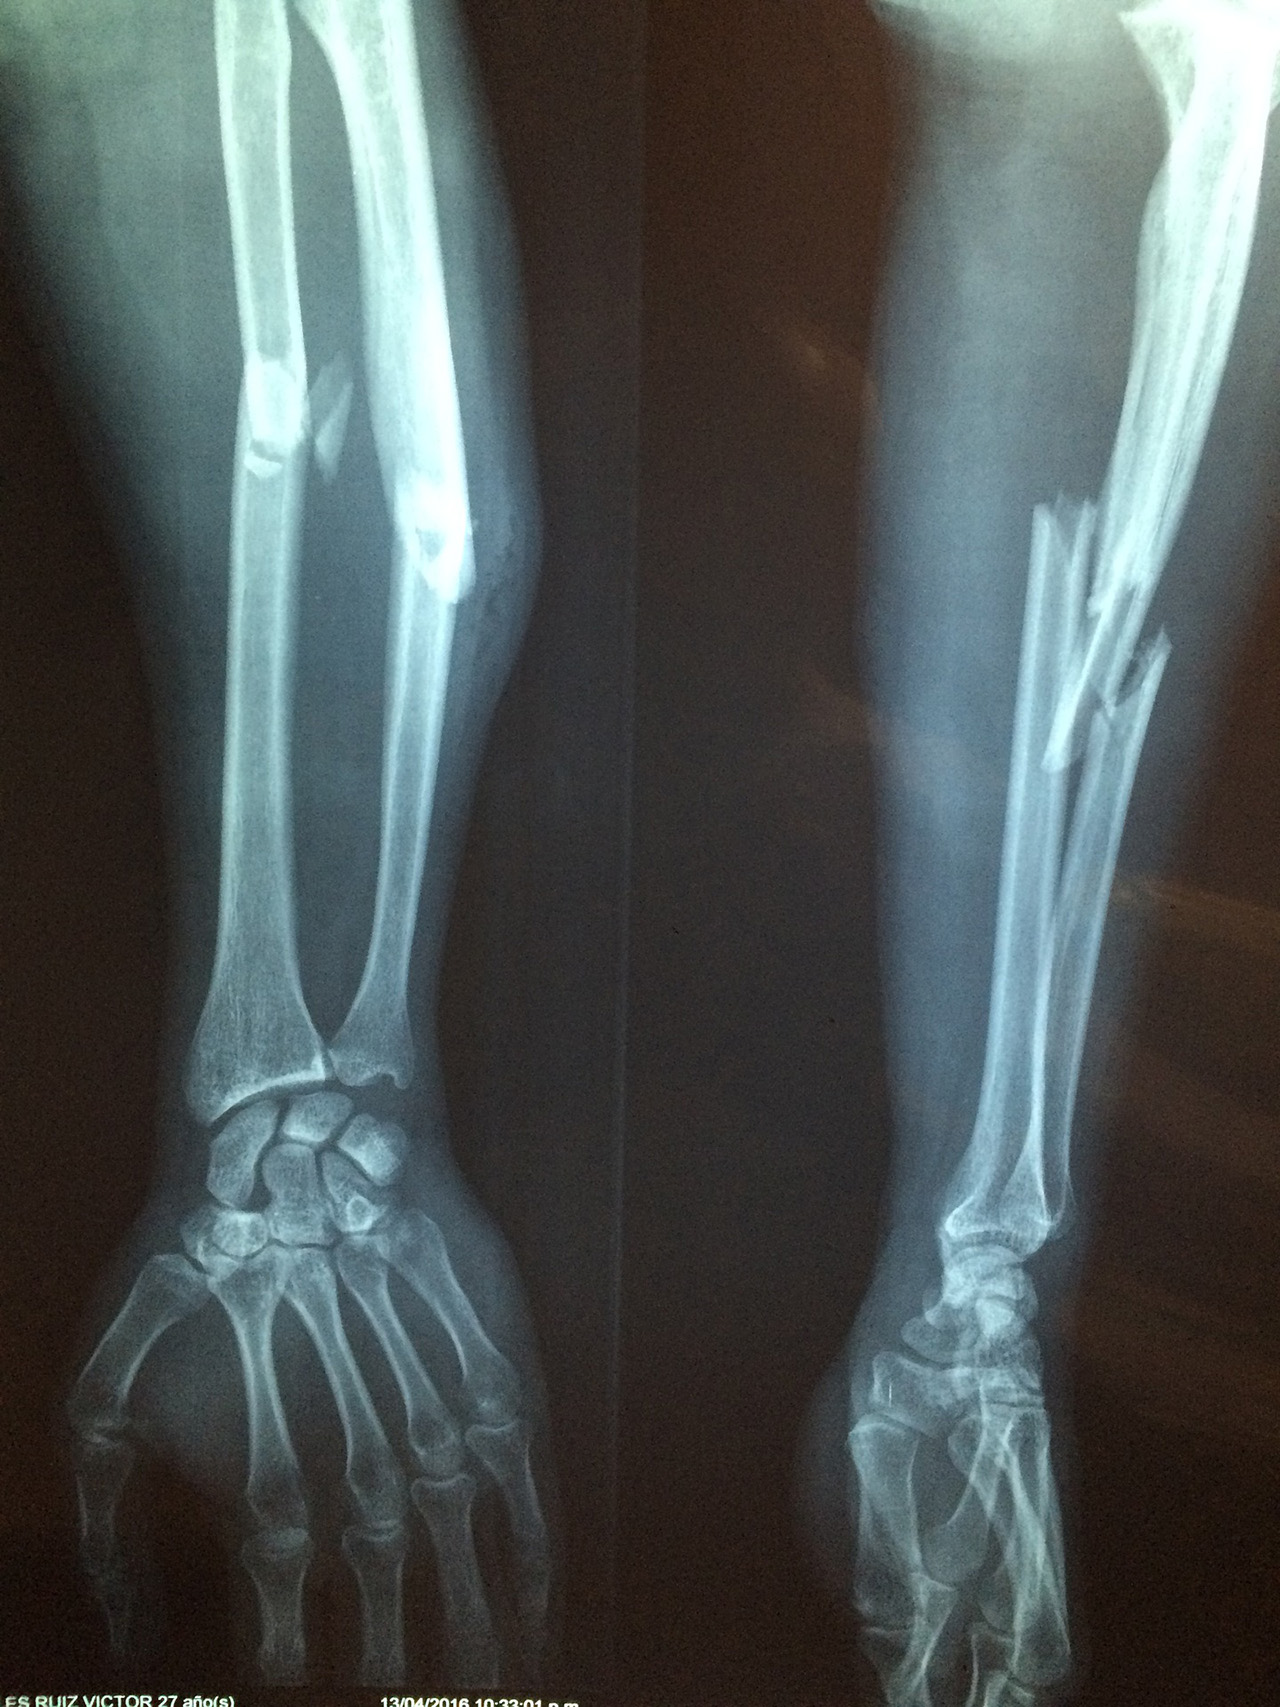 Arm Bone Structure